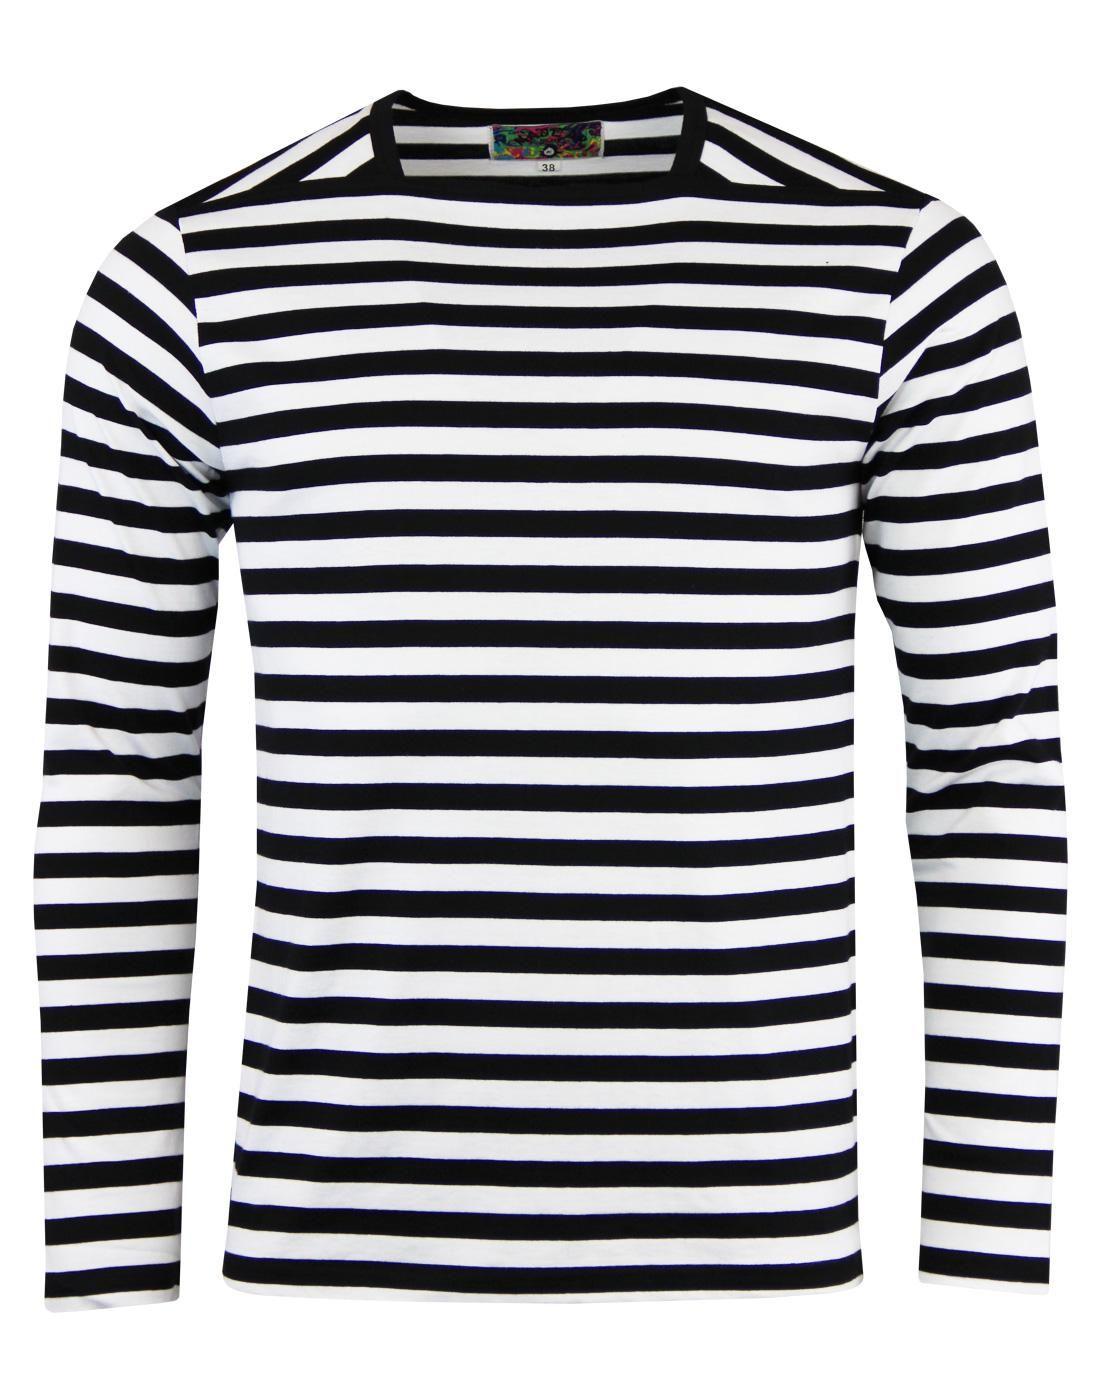 ceb61fb5d59 King Bee Retro Mod Atom Neck Long Sleeve T-Shirt in Black/White ...